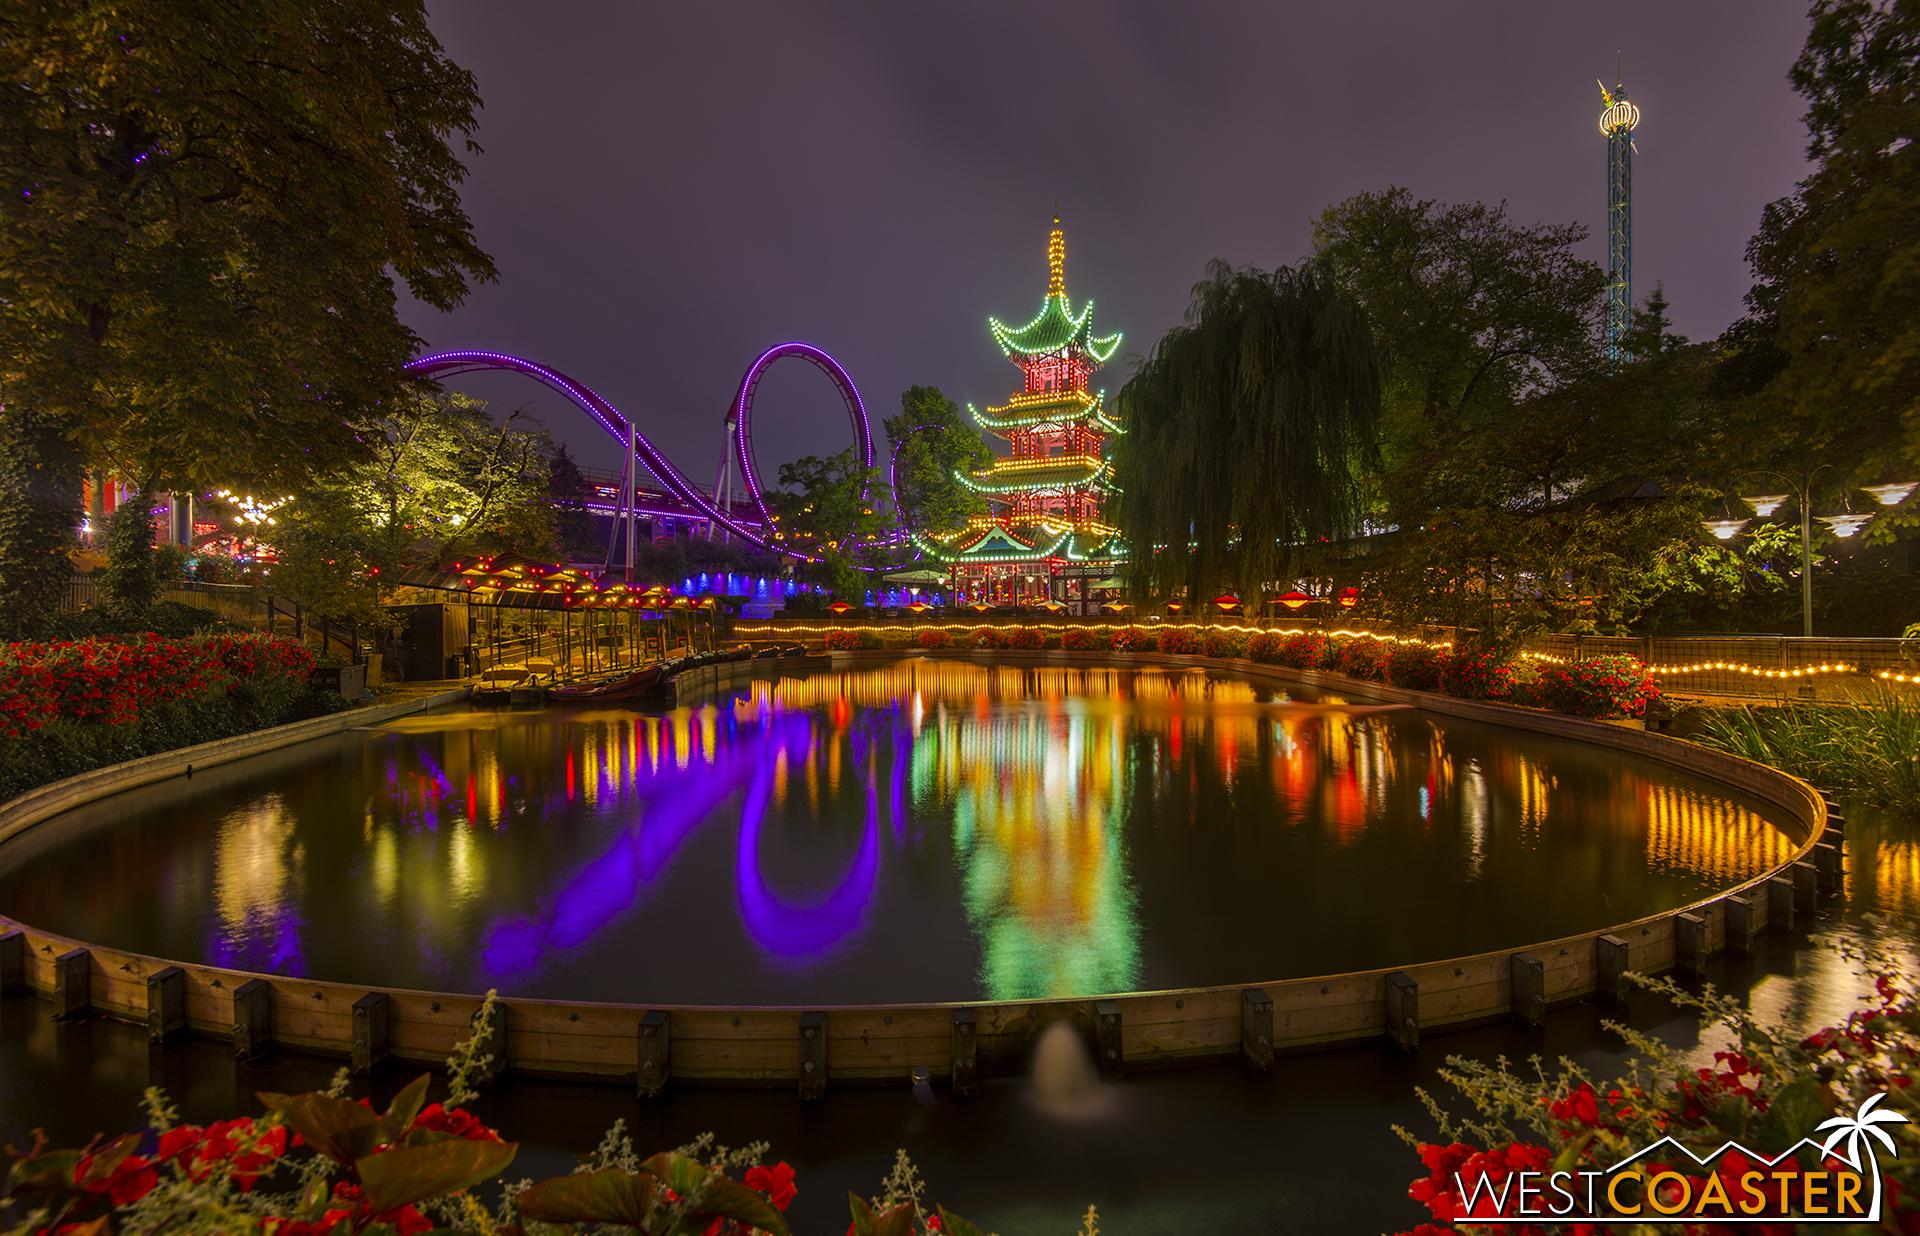 Tivoli Gardens sparkles with magic at night.